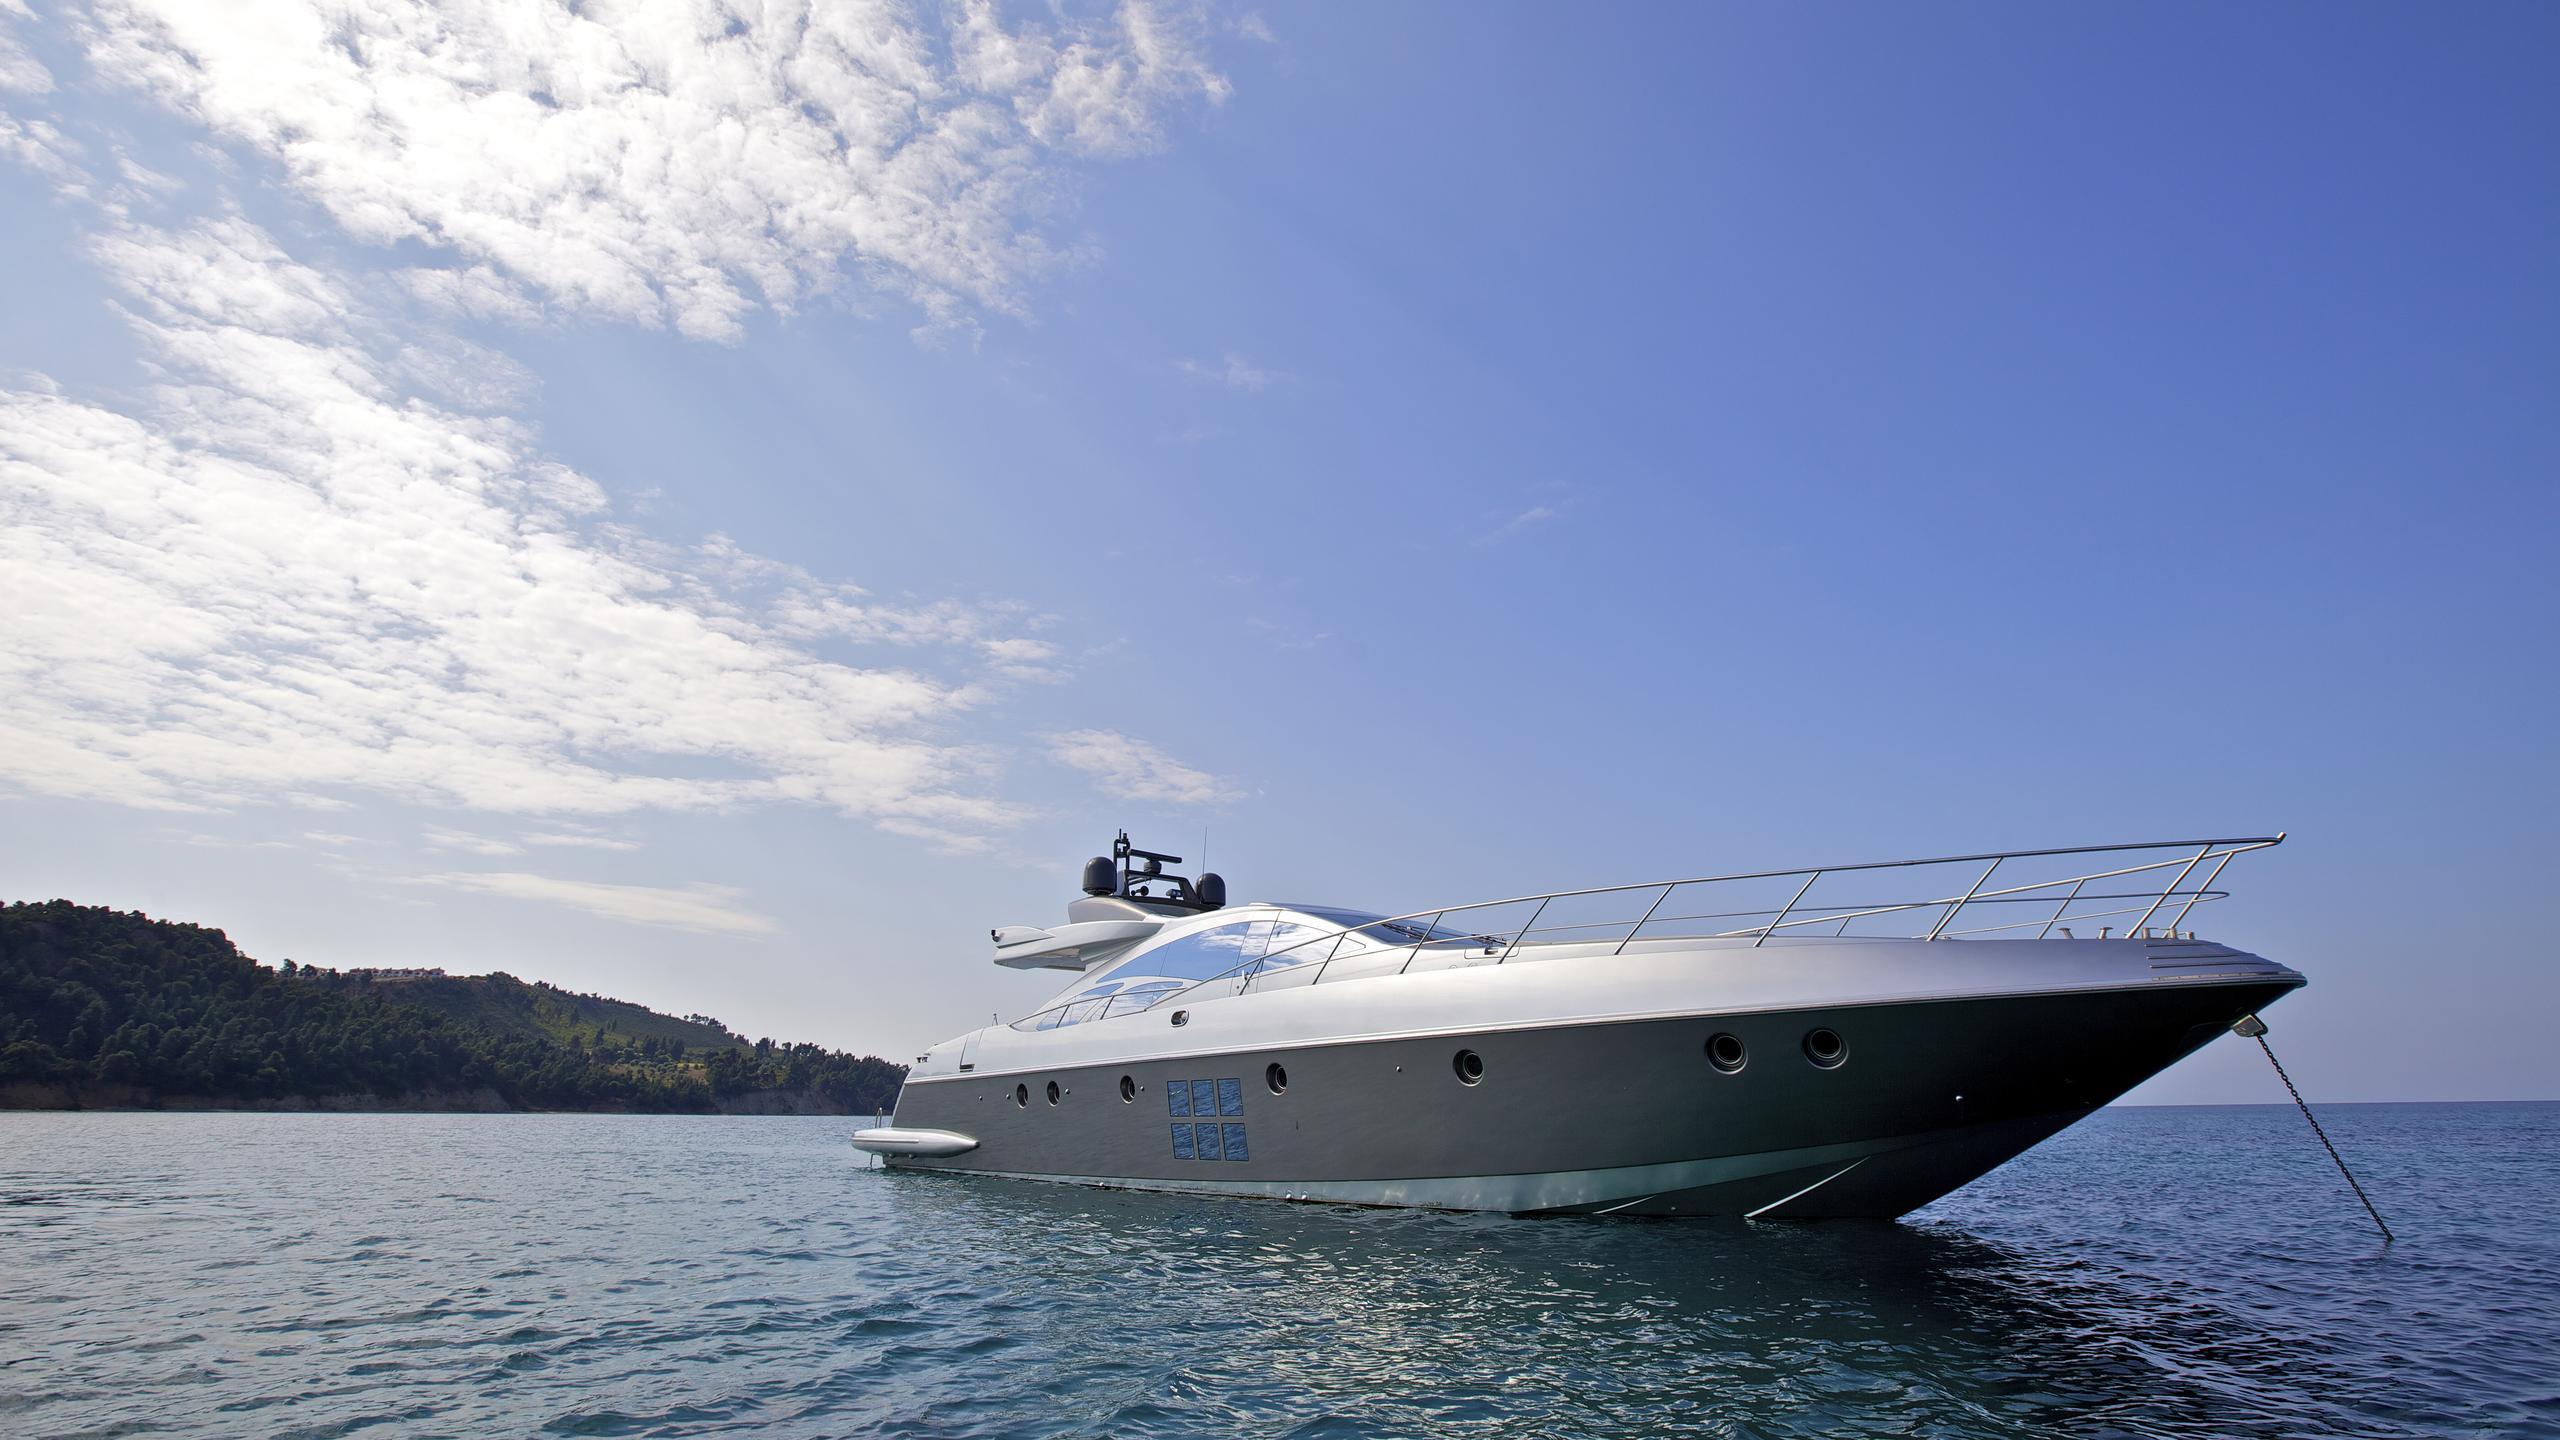 thea-malta-yacht-at-anchor